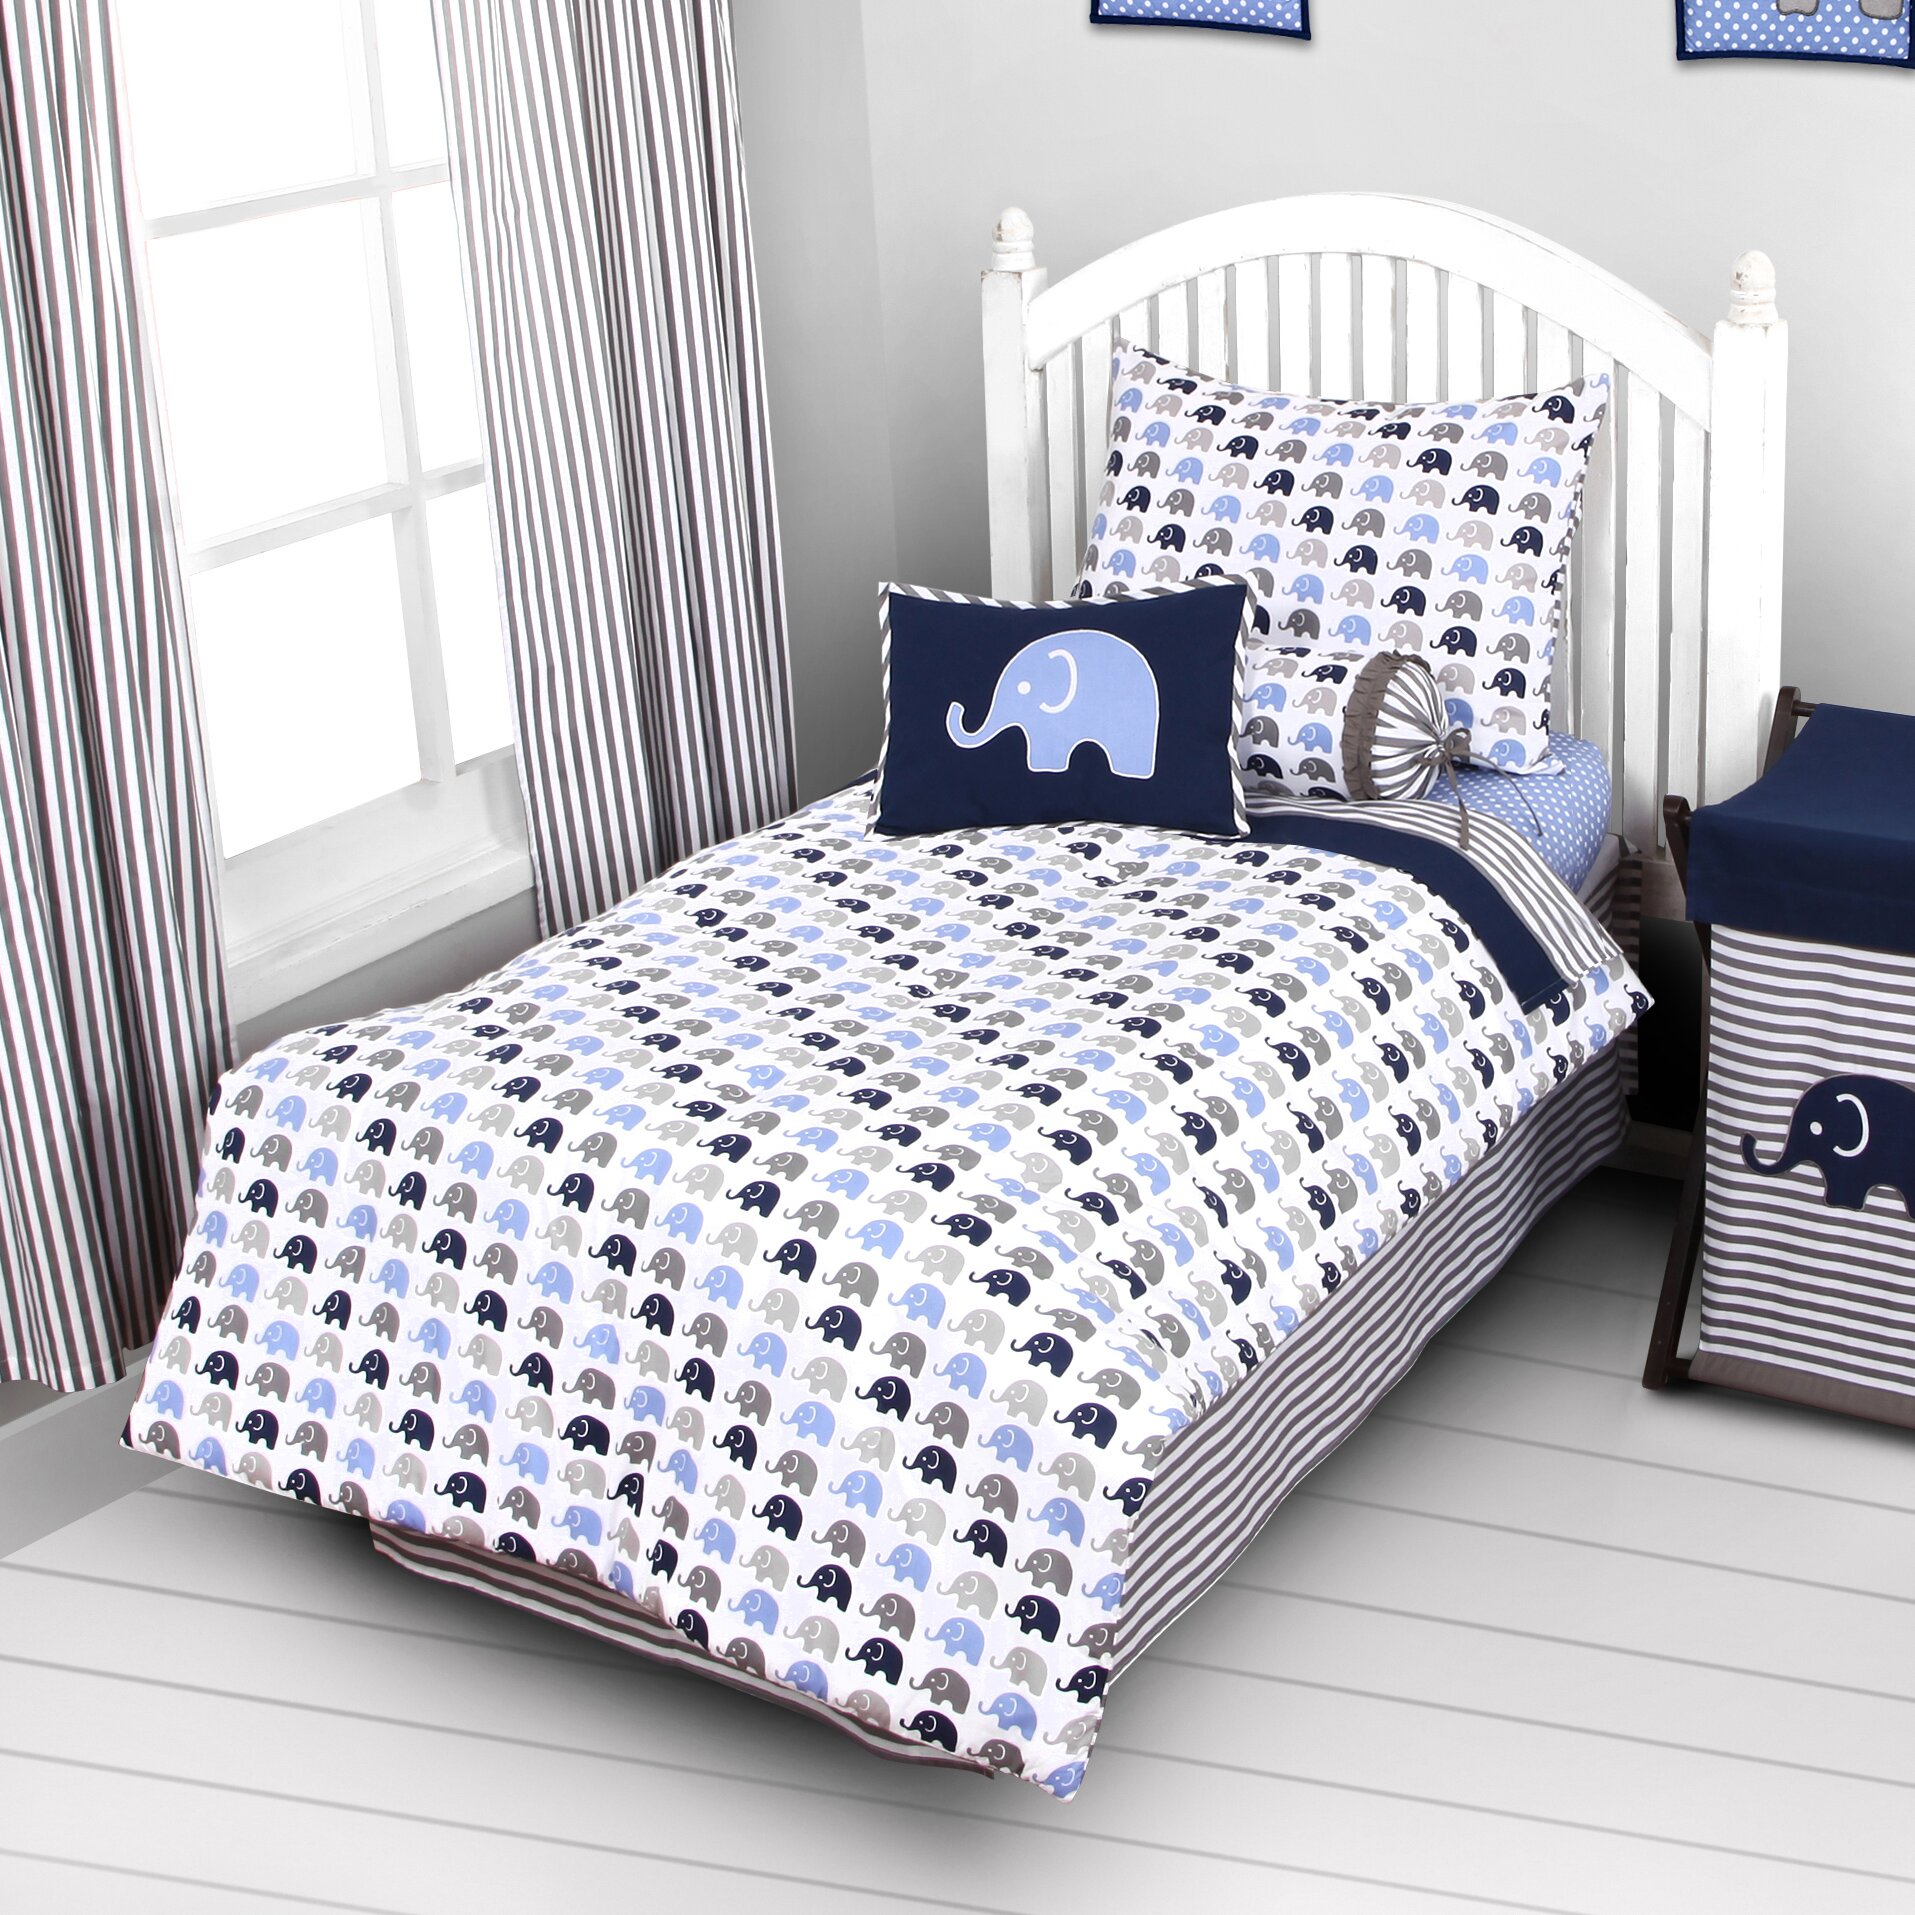 bacati elephants 3 piece toddler bedding set reviews